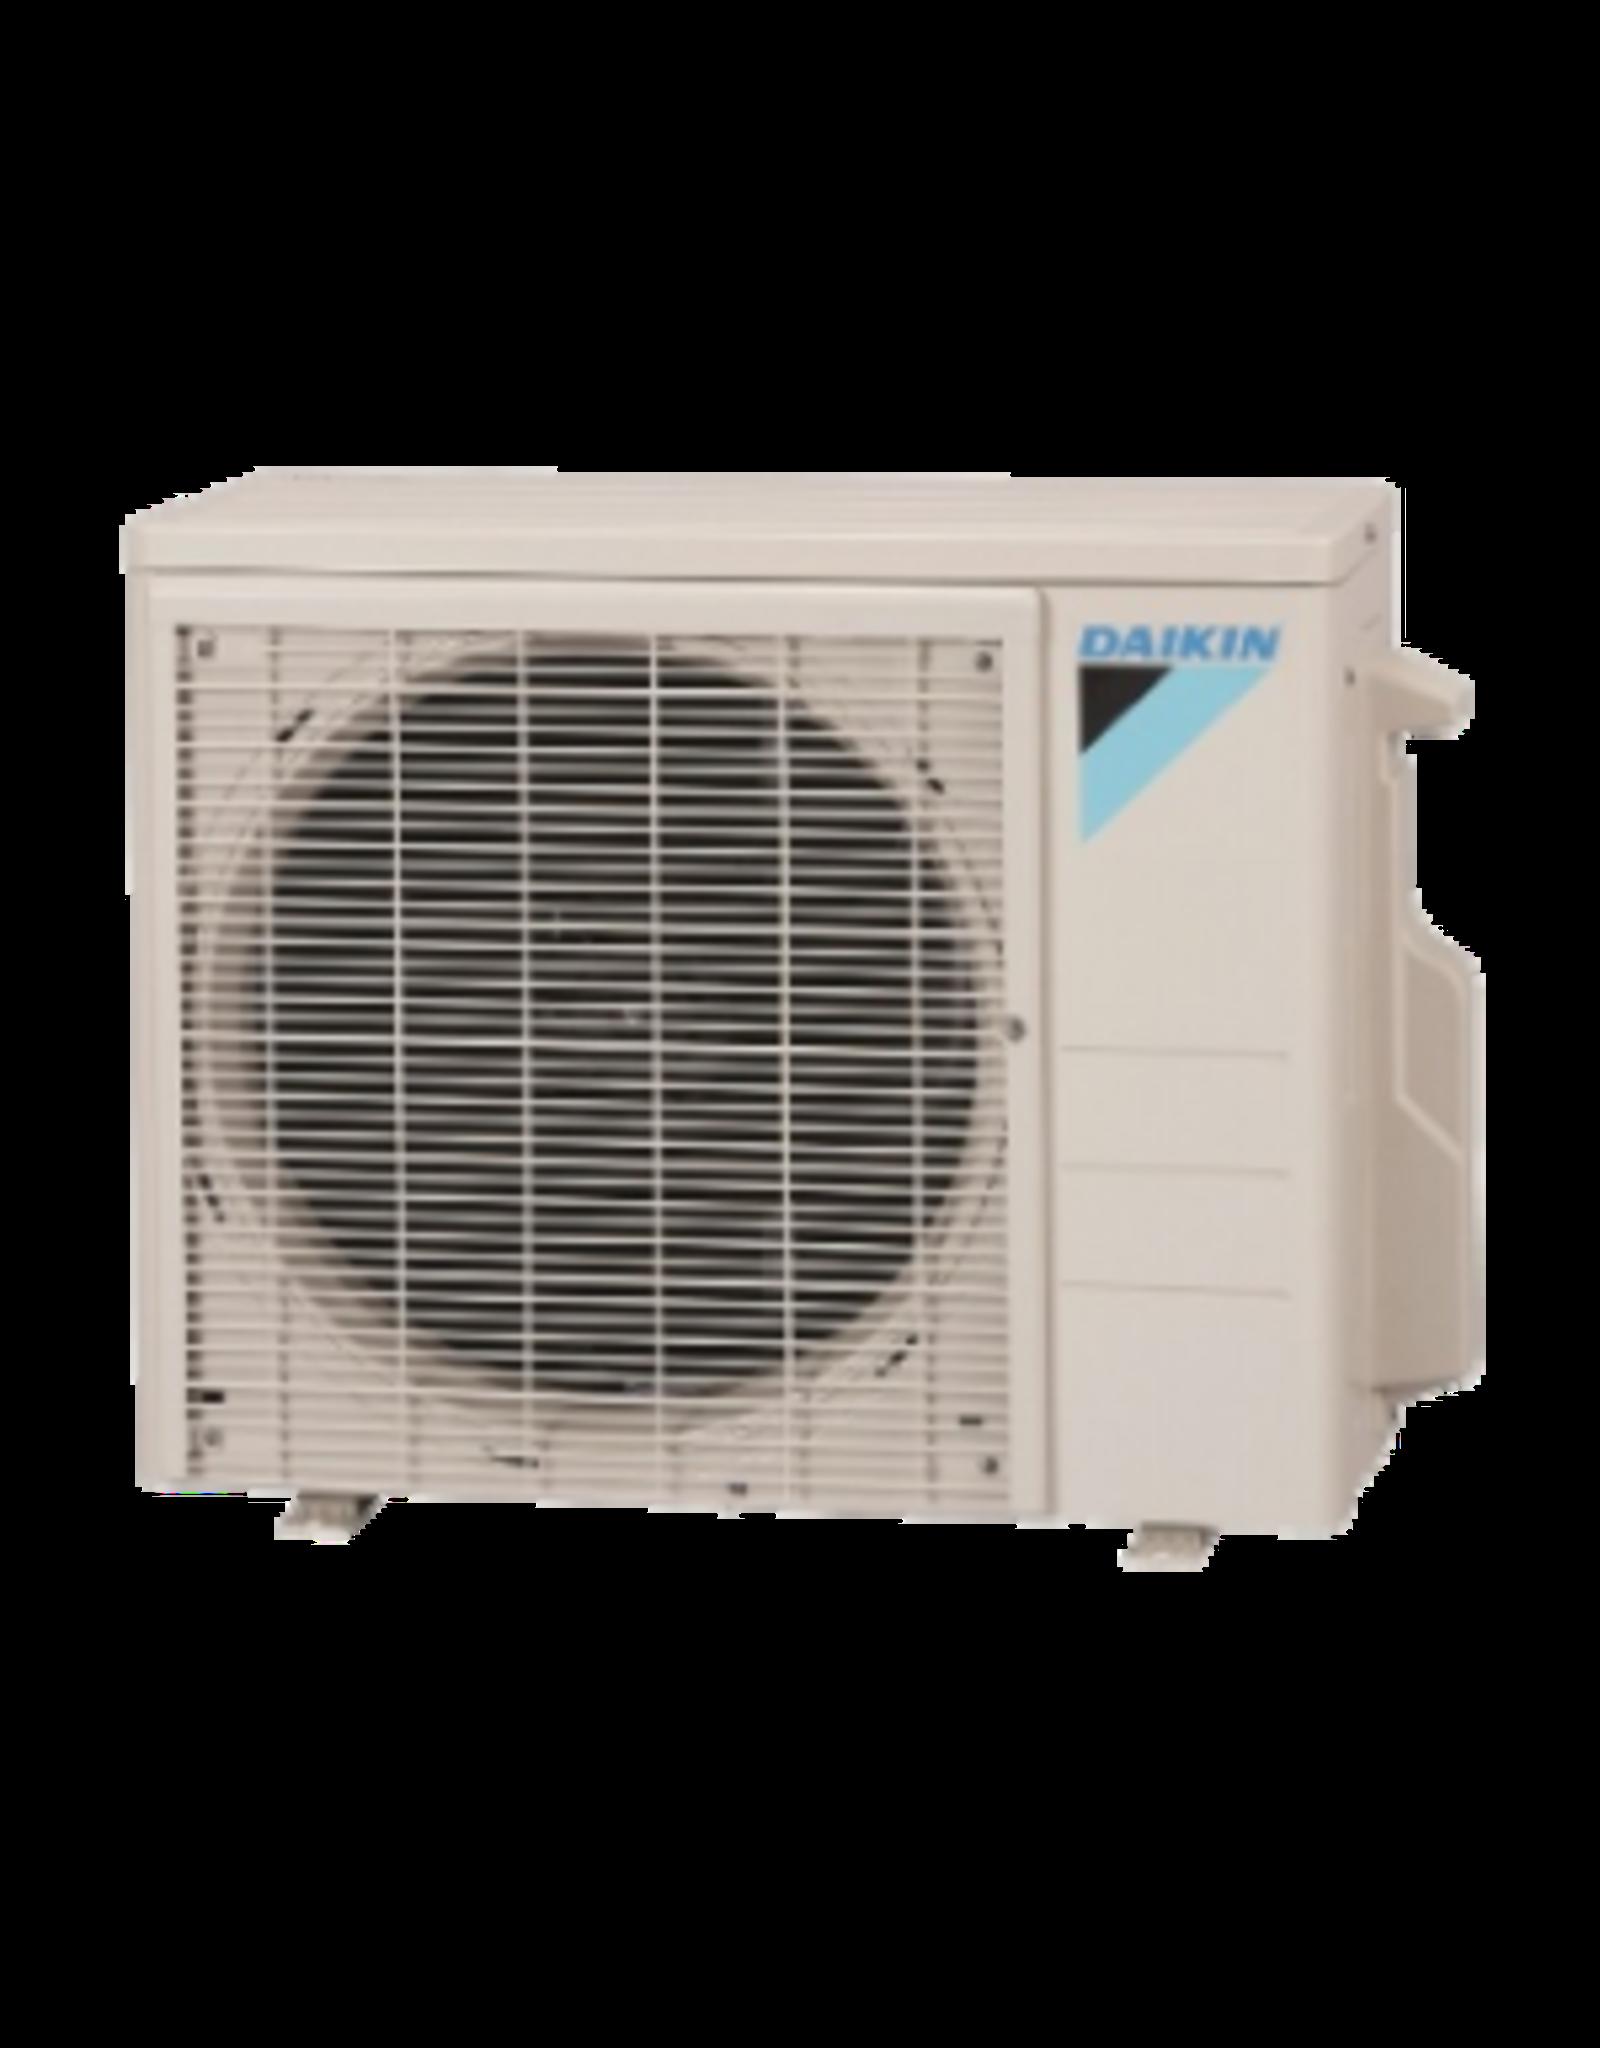 Daikin Applied Americas EMURA Heat Pump Single Zone Condenser Unit  - 208/230v - 1ph